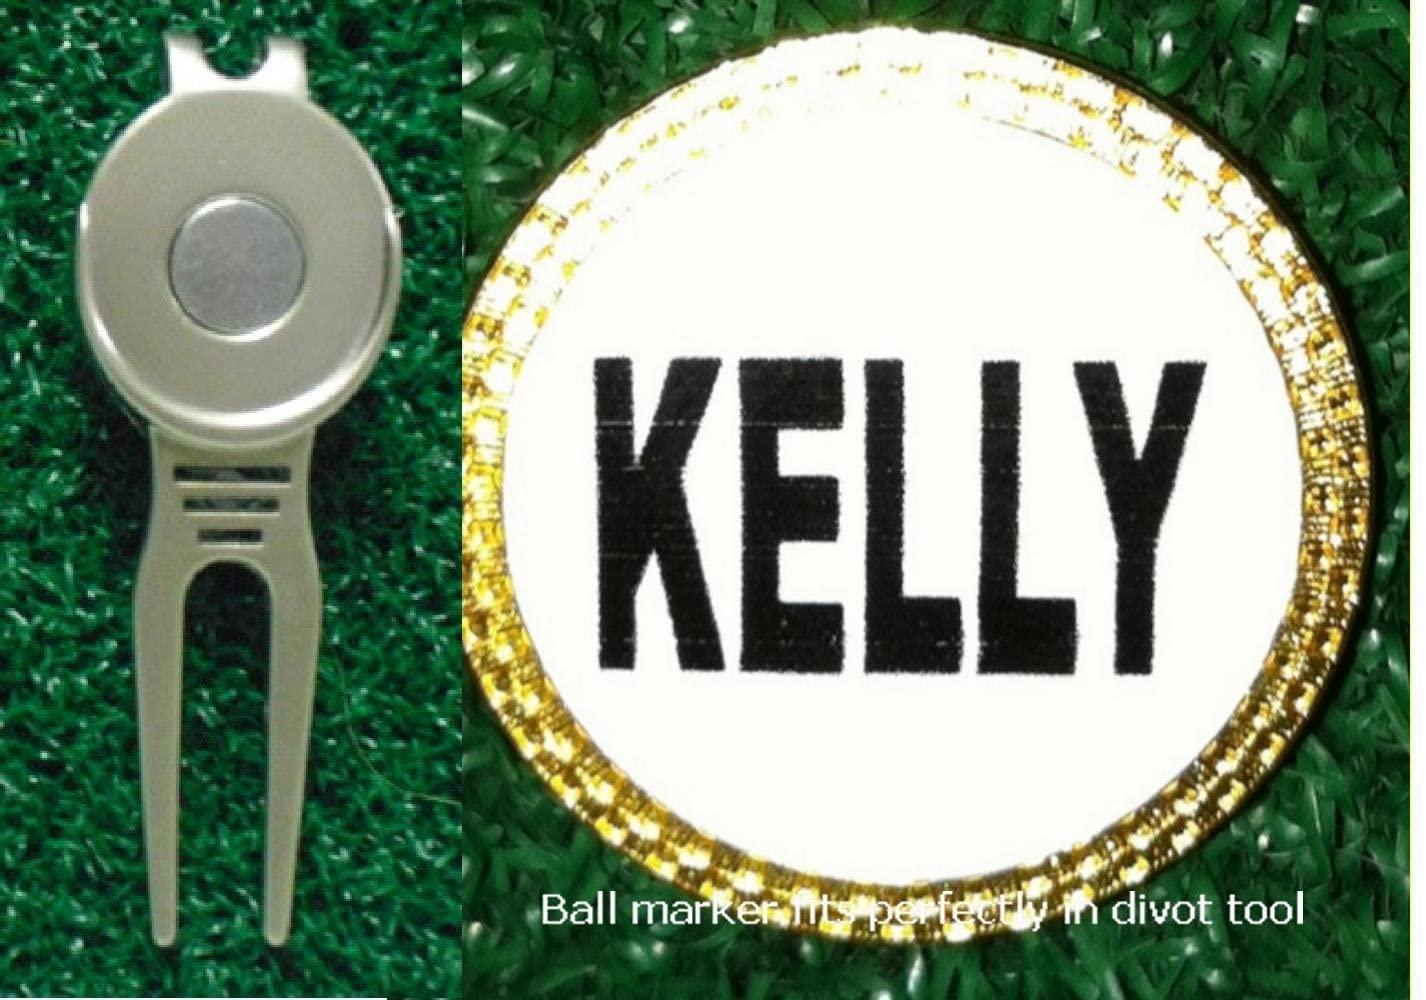 Gatormade Personalized Golf Ball Marker & Divot Tool Kelly